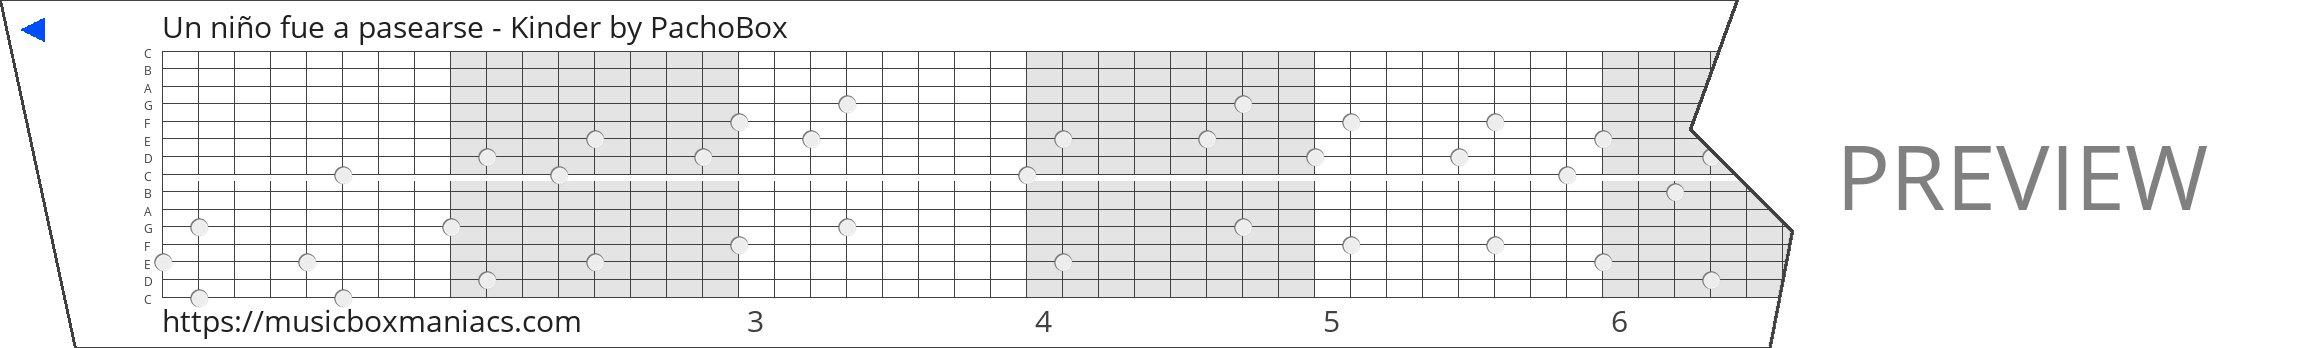 Un niño fue a pasearse - Kinder 15 note music box paper strip